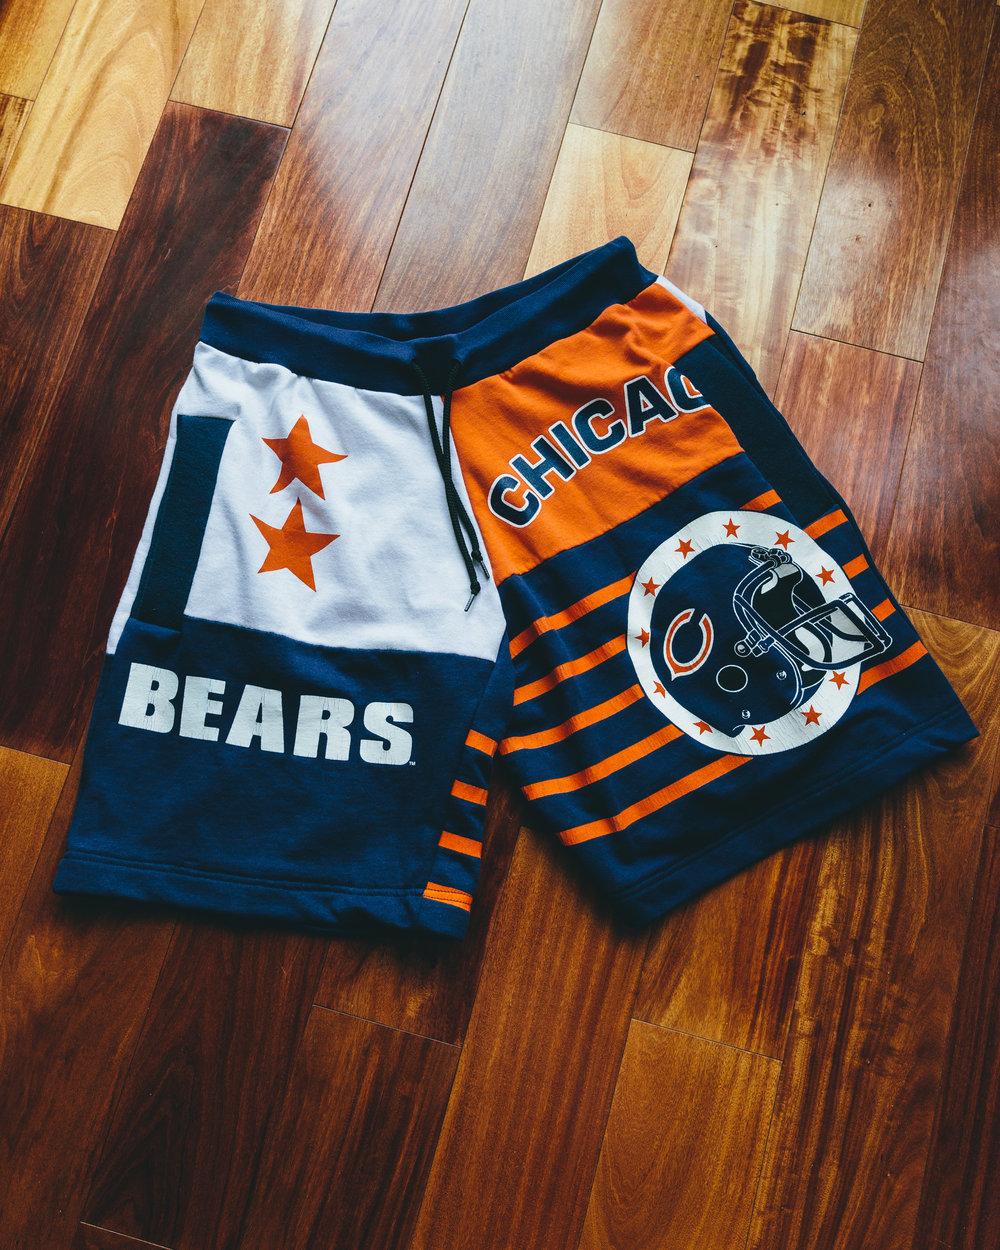 Bears Shorts - Made from vintage bears shorts